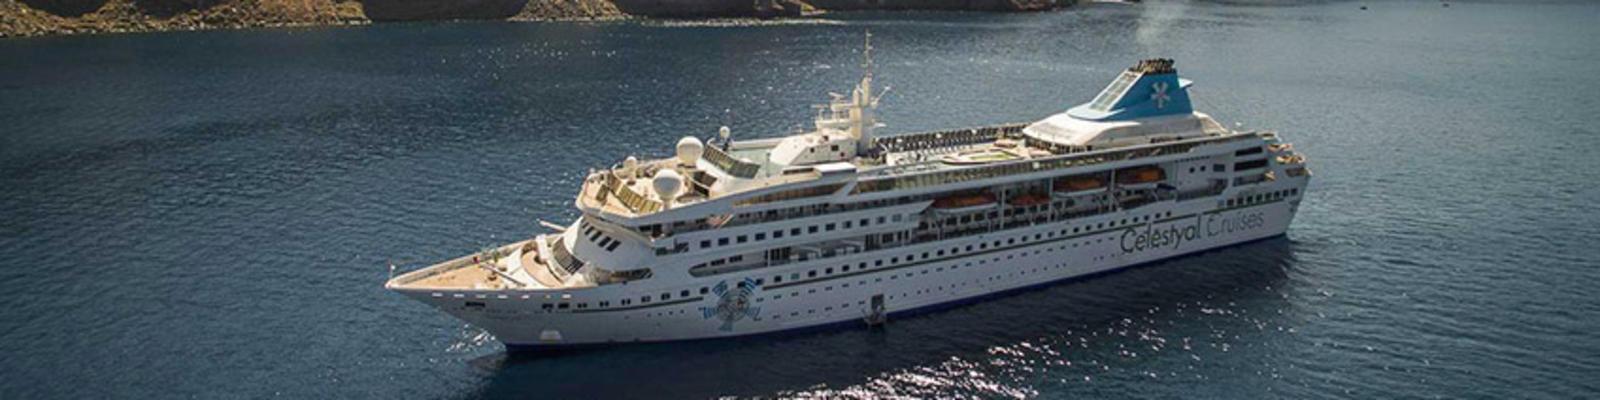 Best Celestyal Cruises Cruises 2018 Reviews Photos